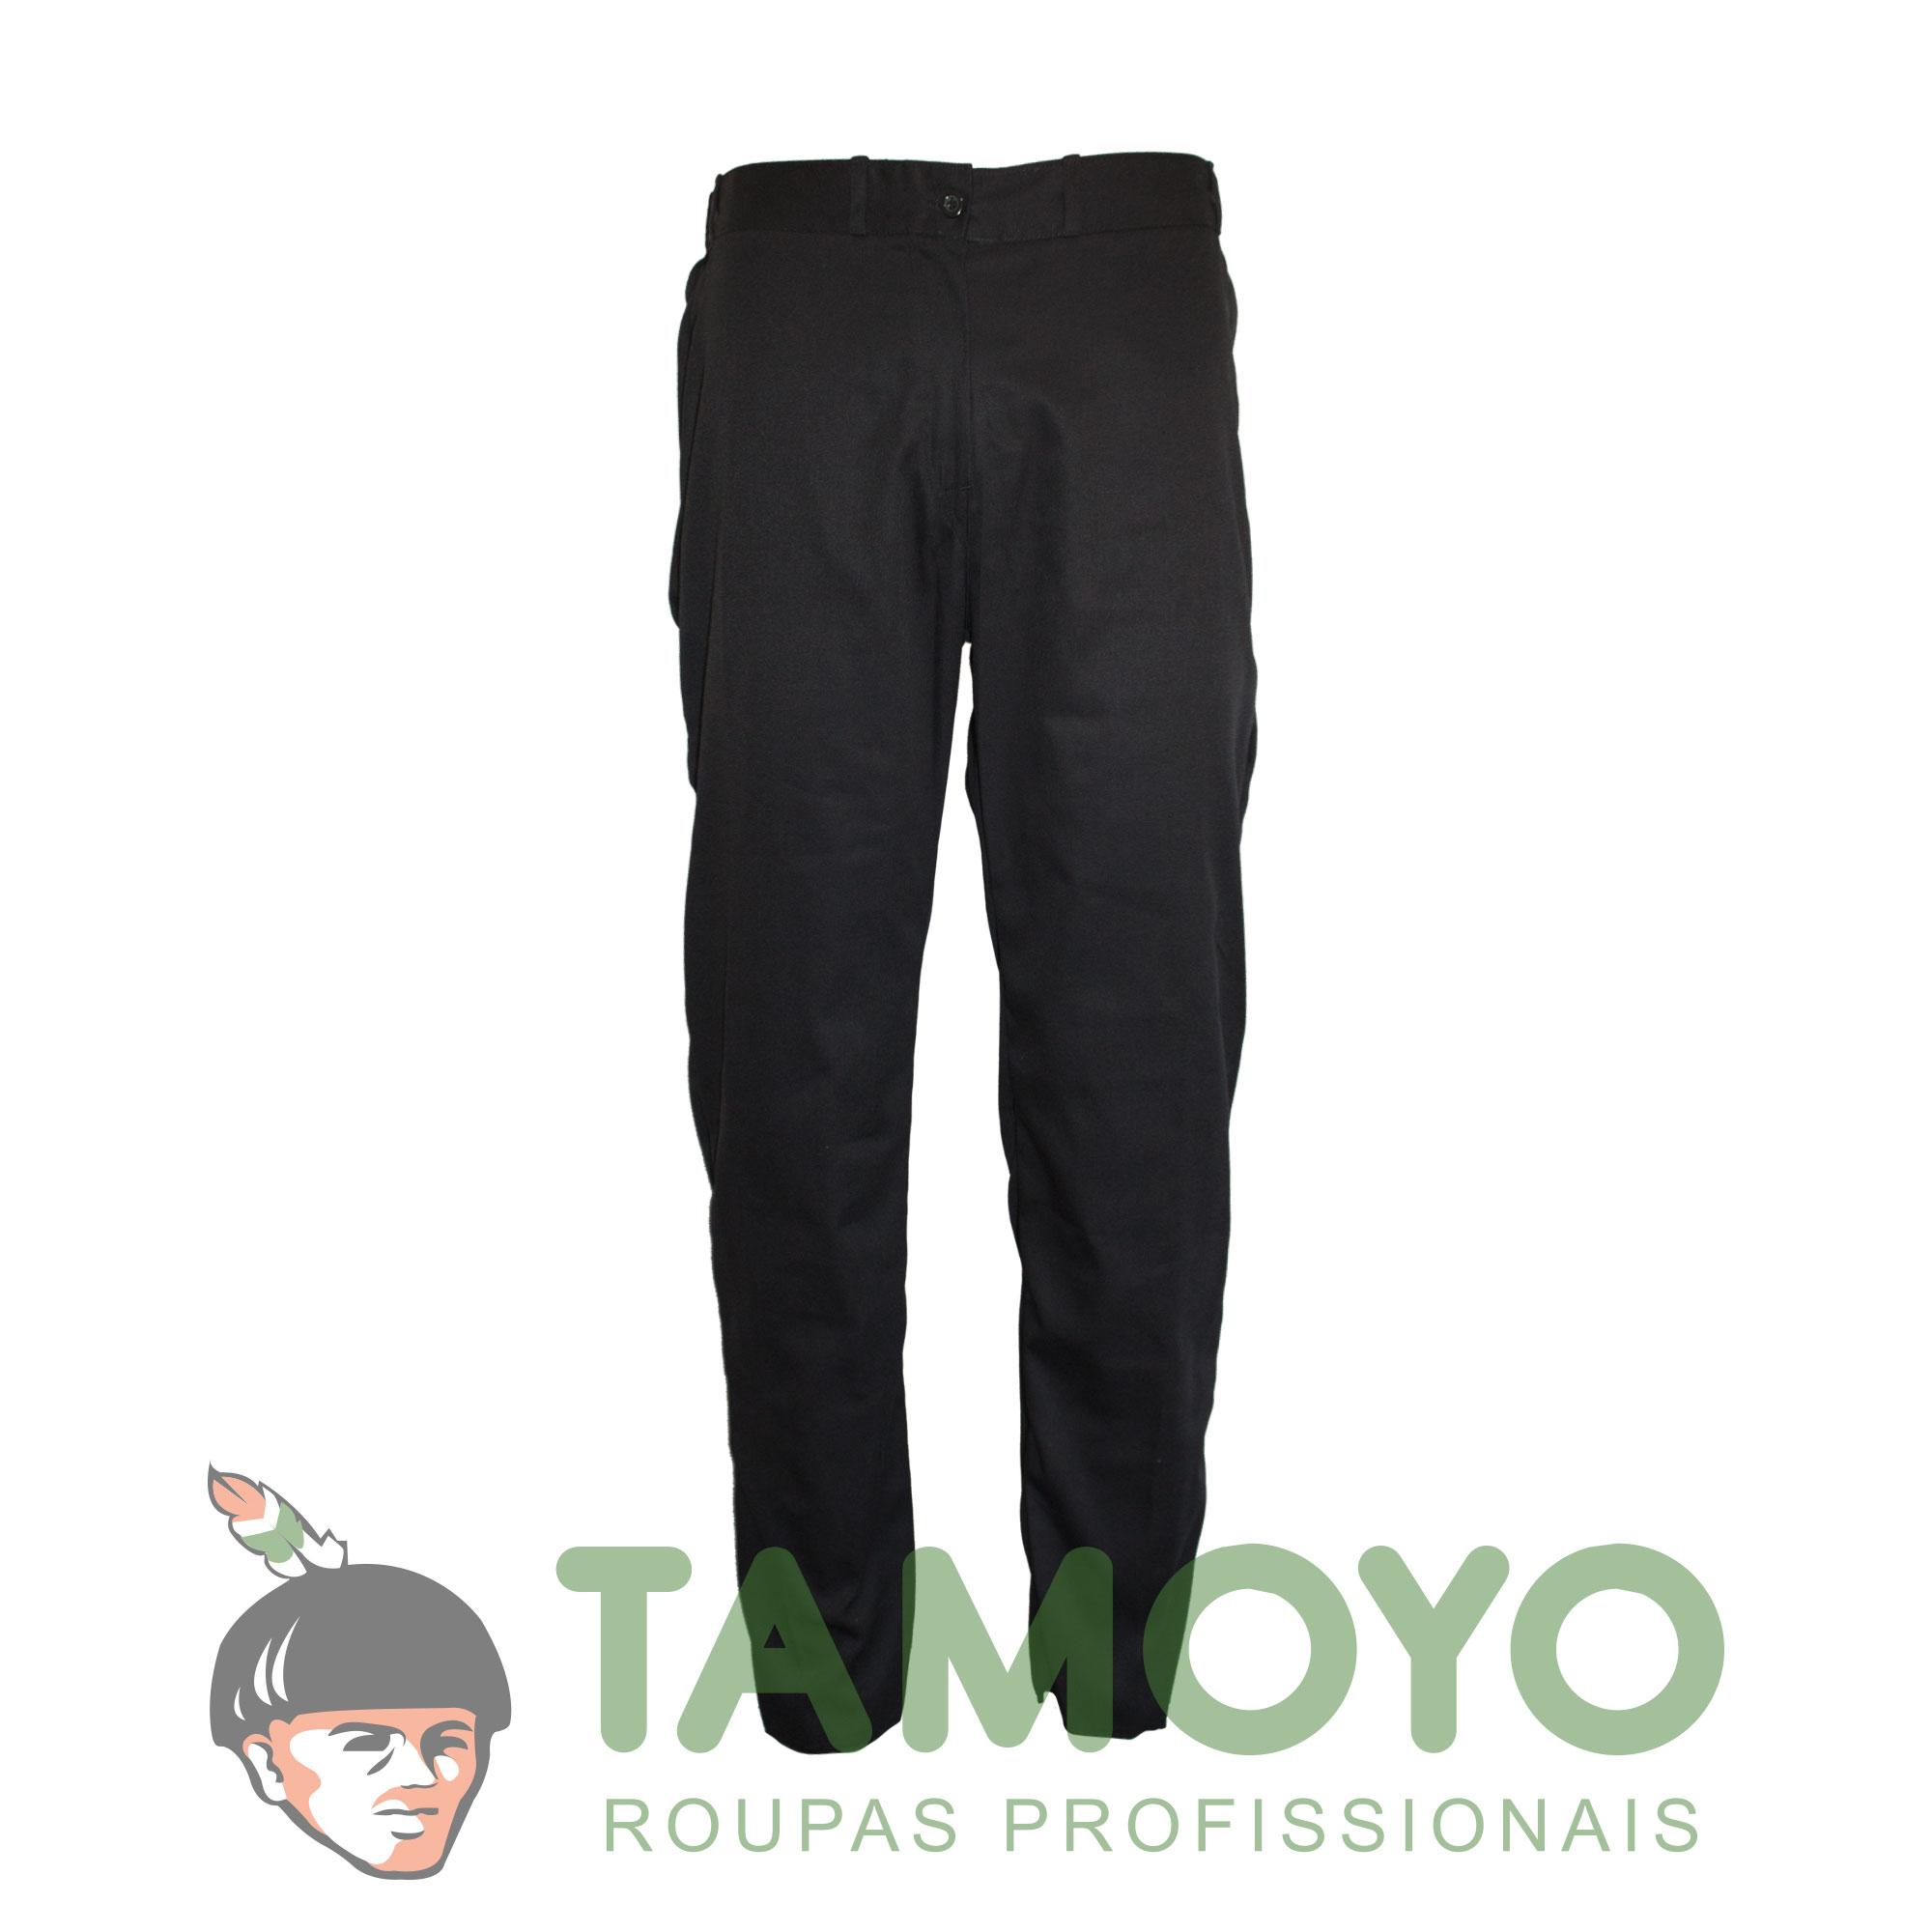 calca-atendente-feminino-roupas-tamoyo-uniformes-profissionais-f